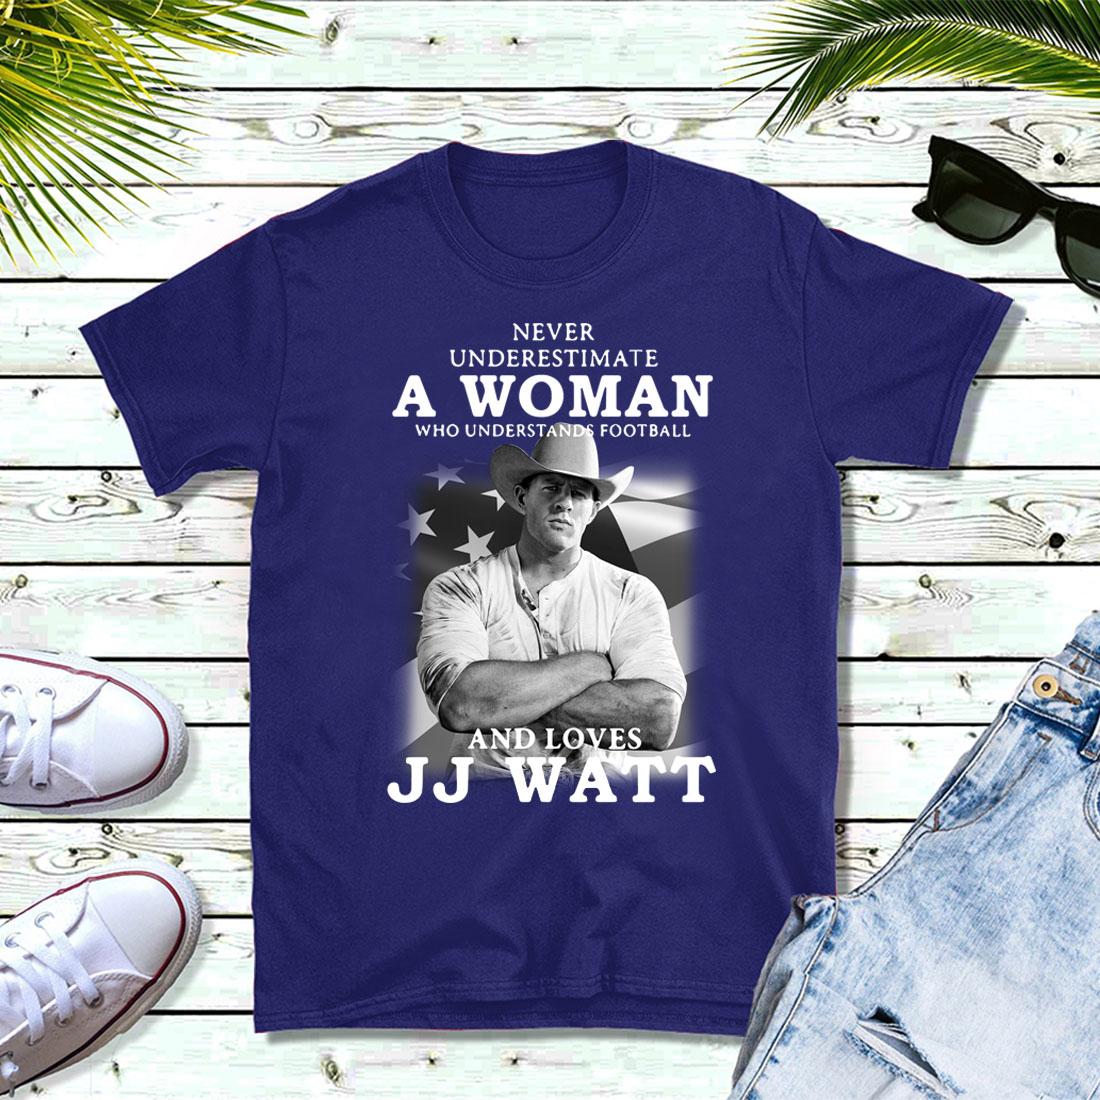 Never underestimate a woman who understands football and loves JJ Watt shirt